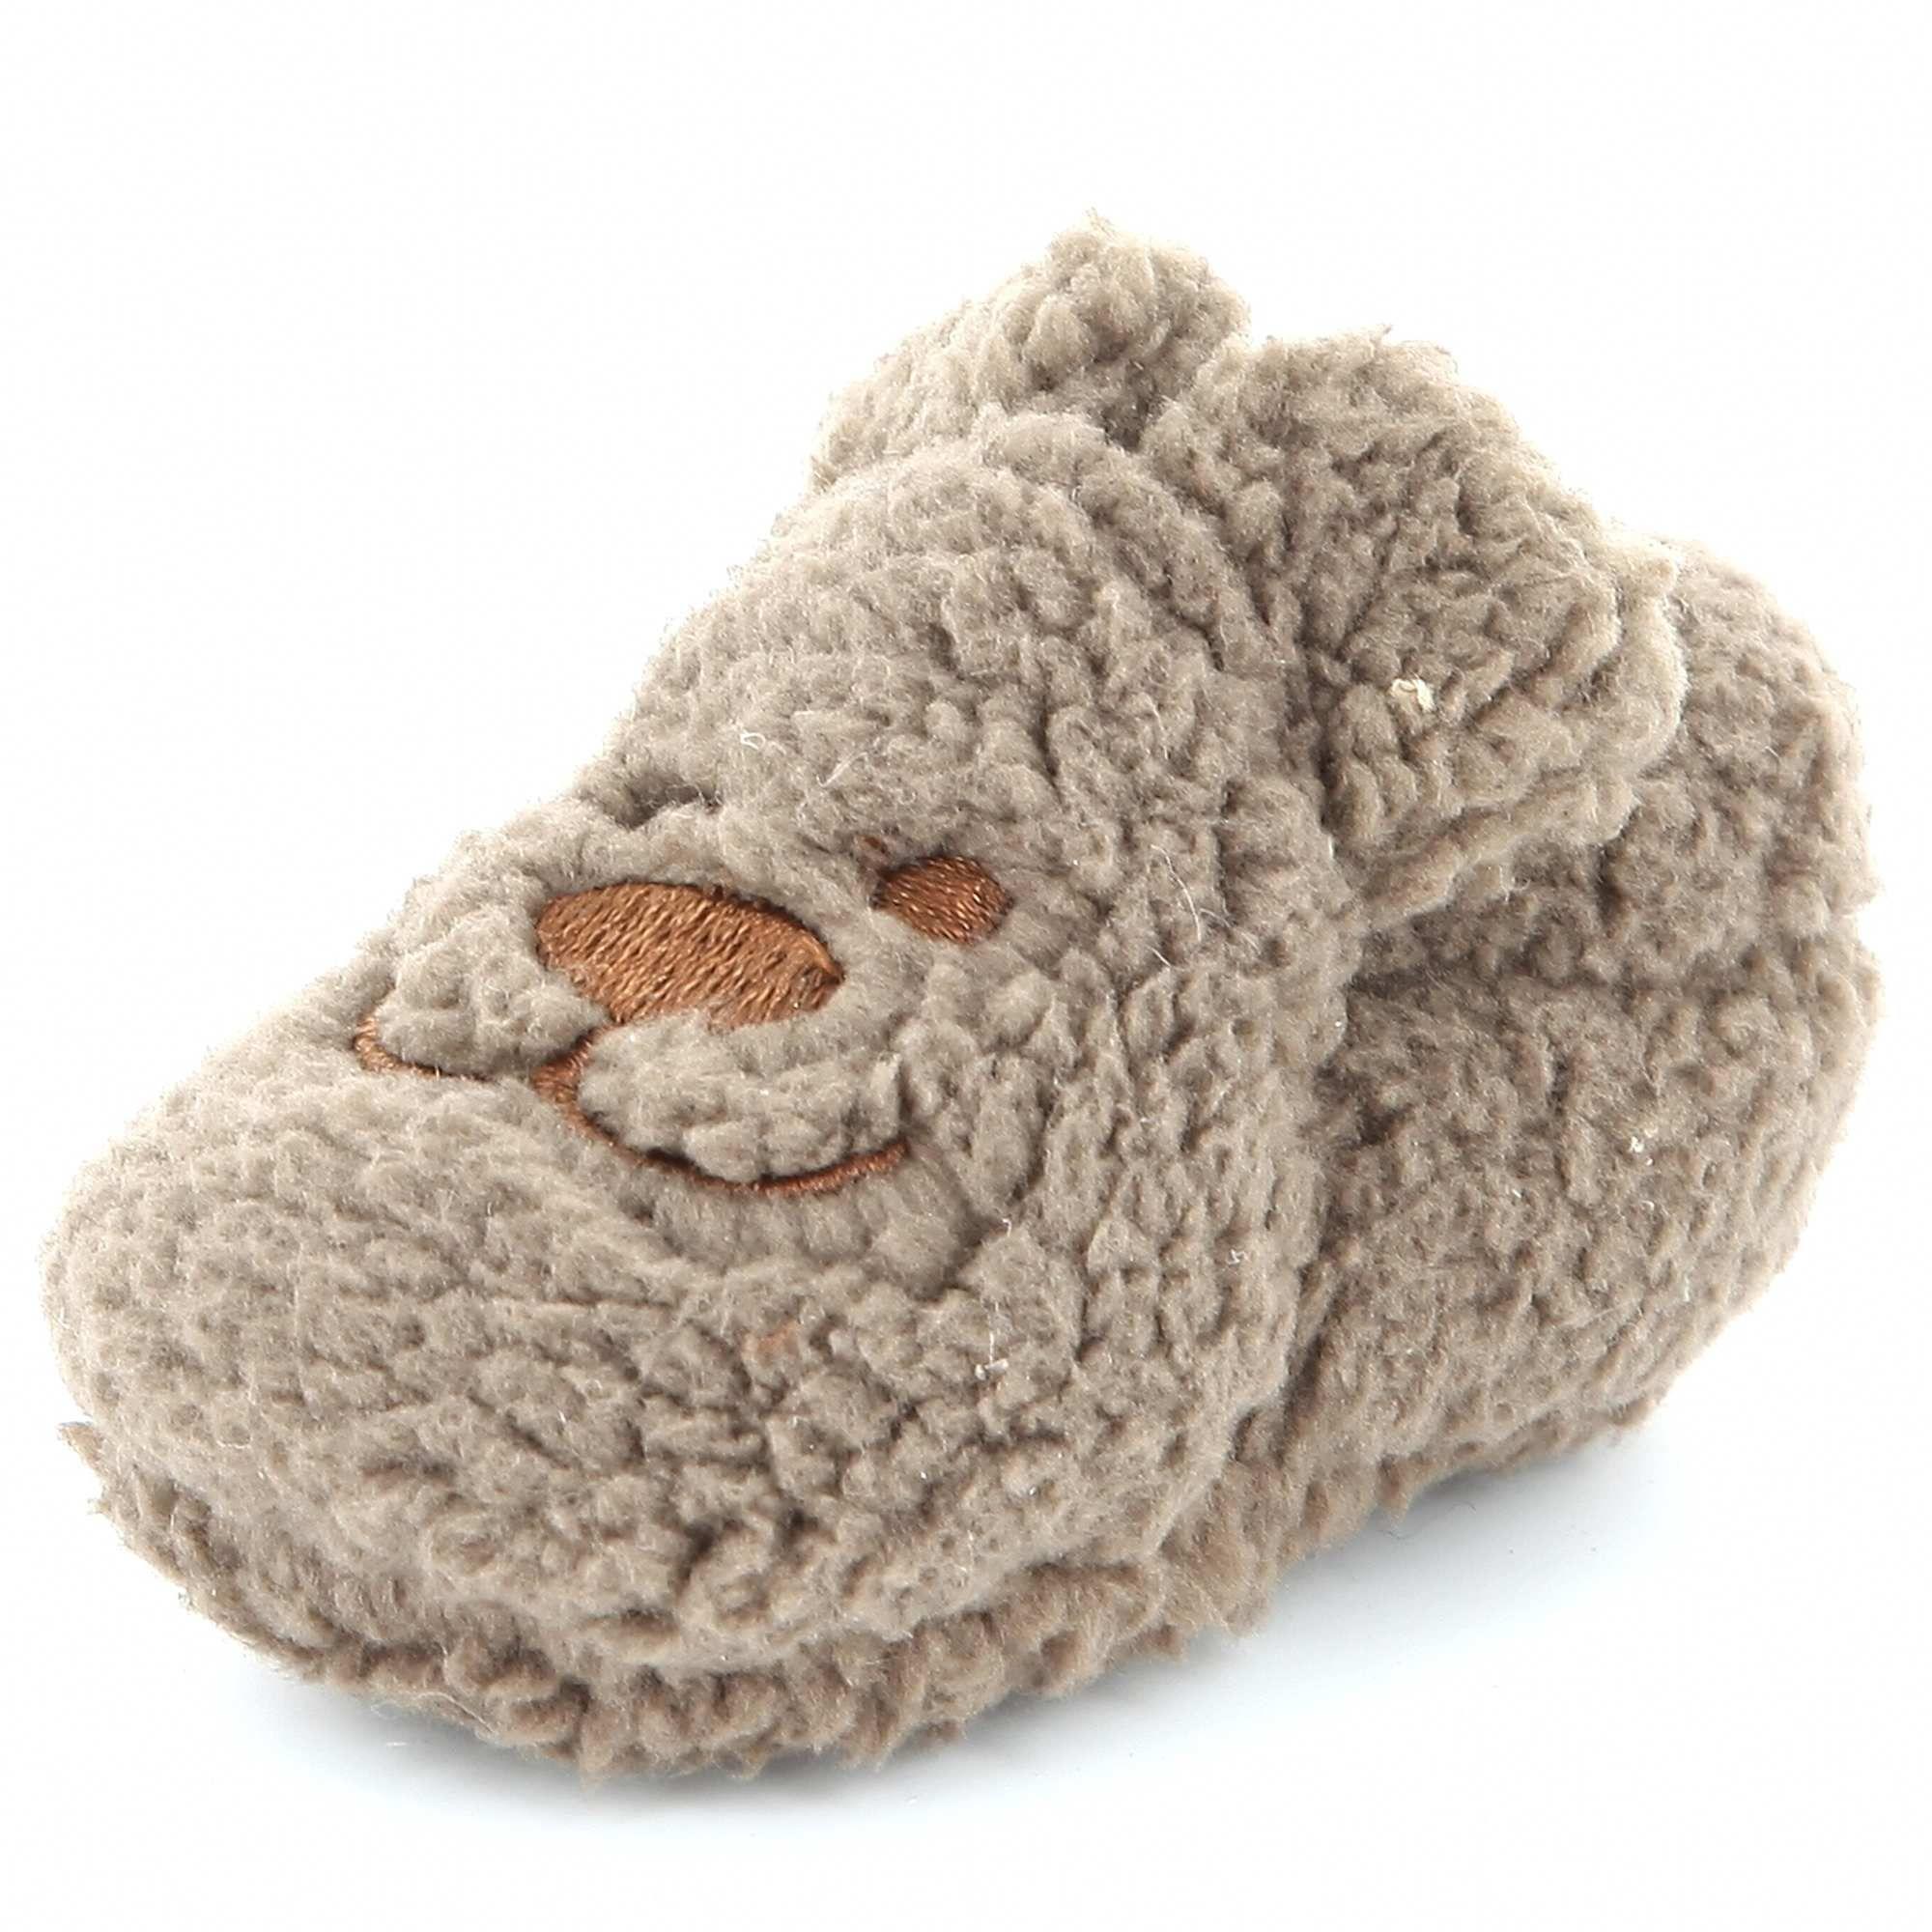 09984543c09fb Chaussons tête d animal marron ours Bébé garçon - Kiabi